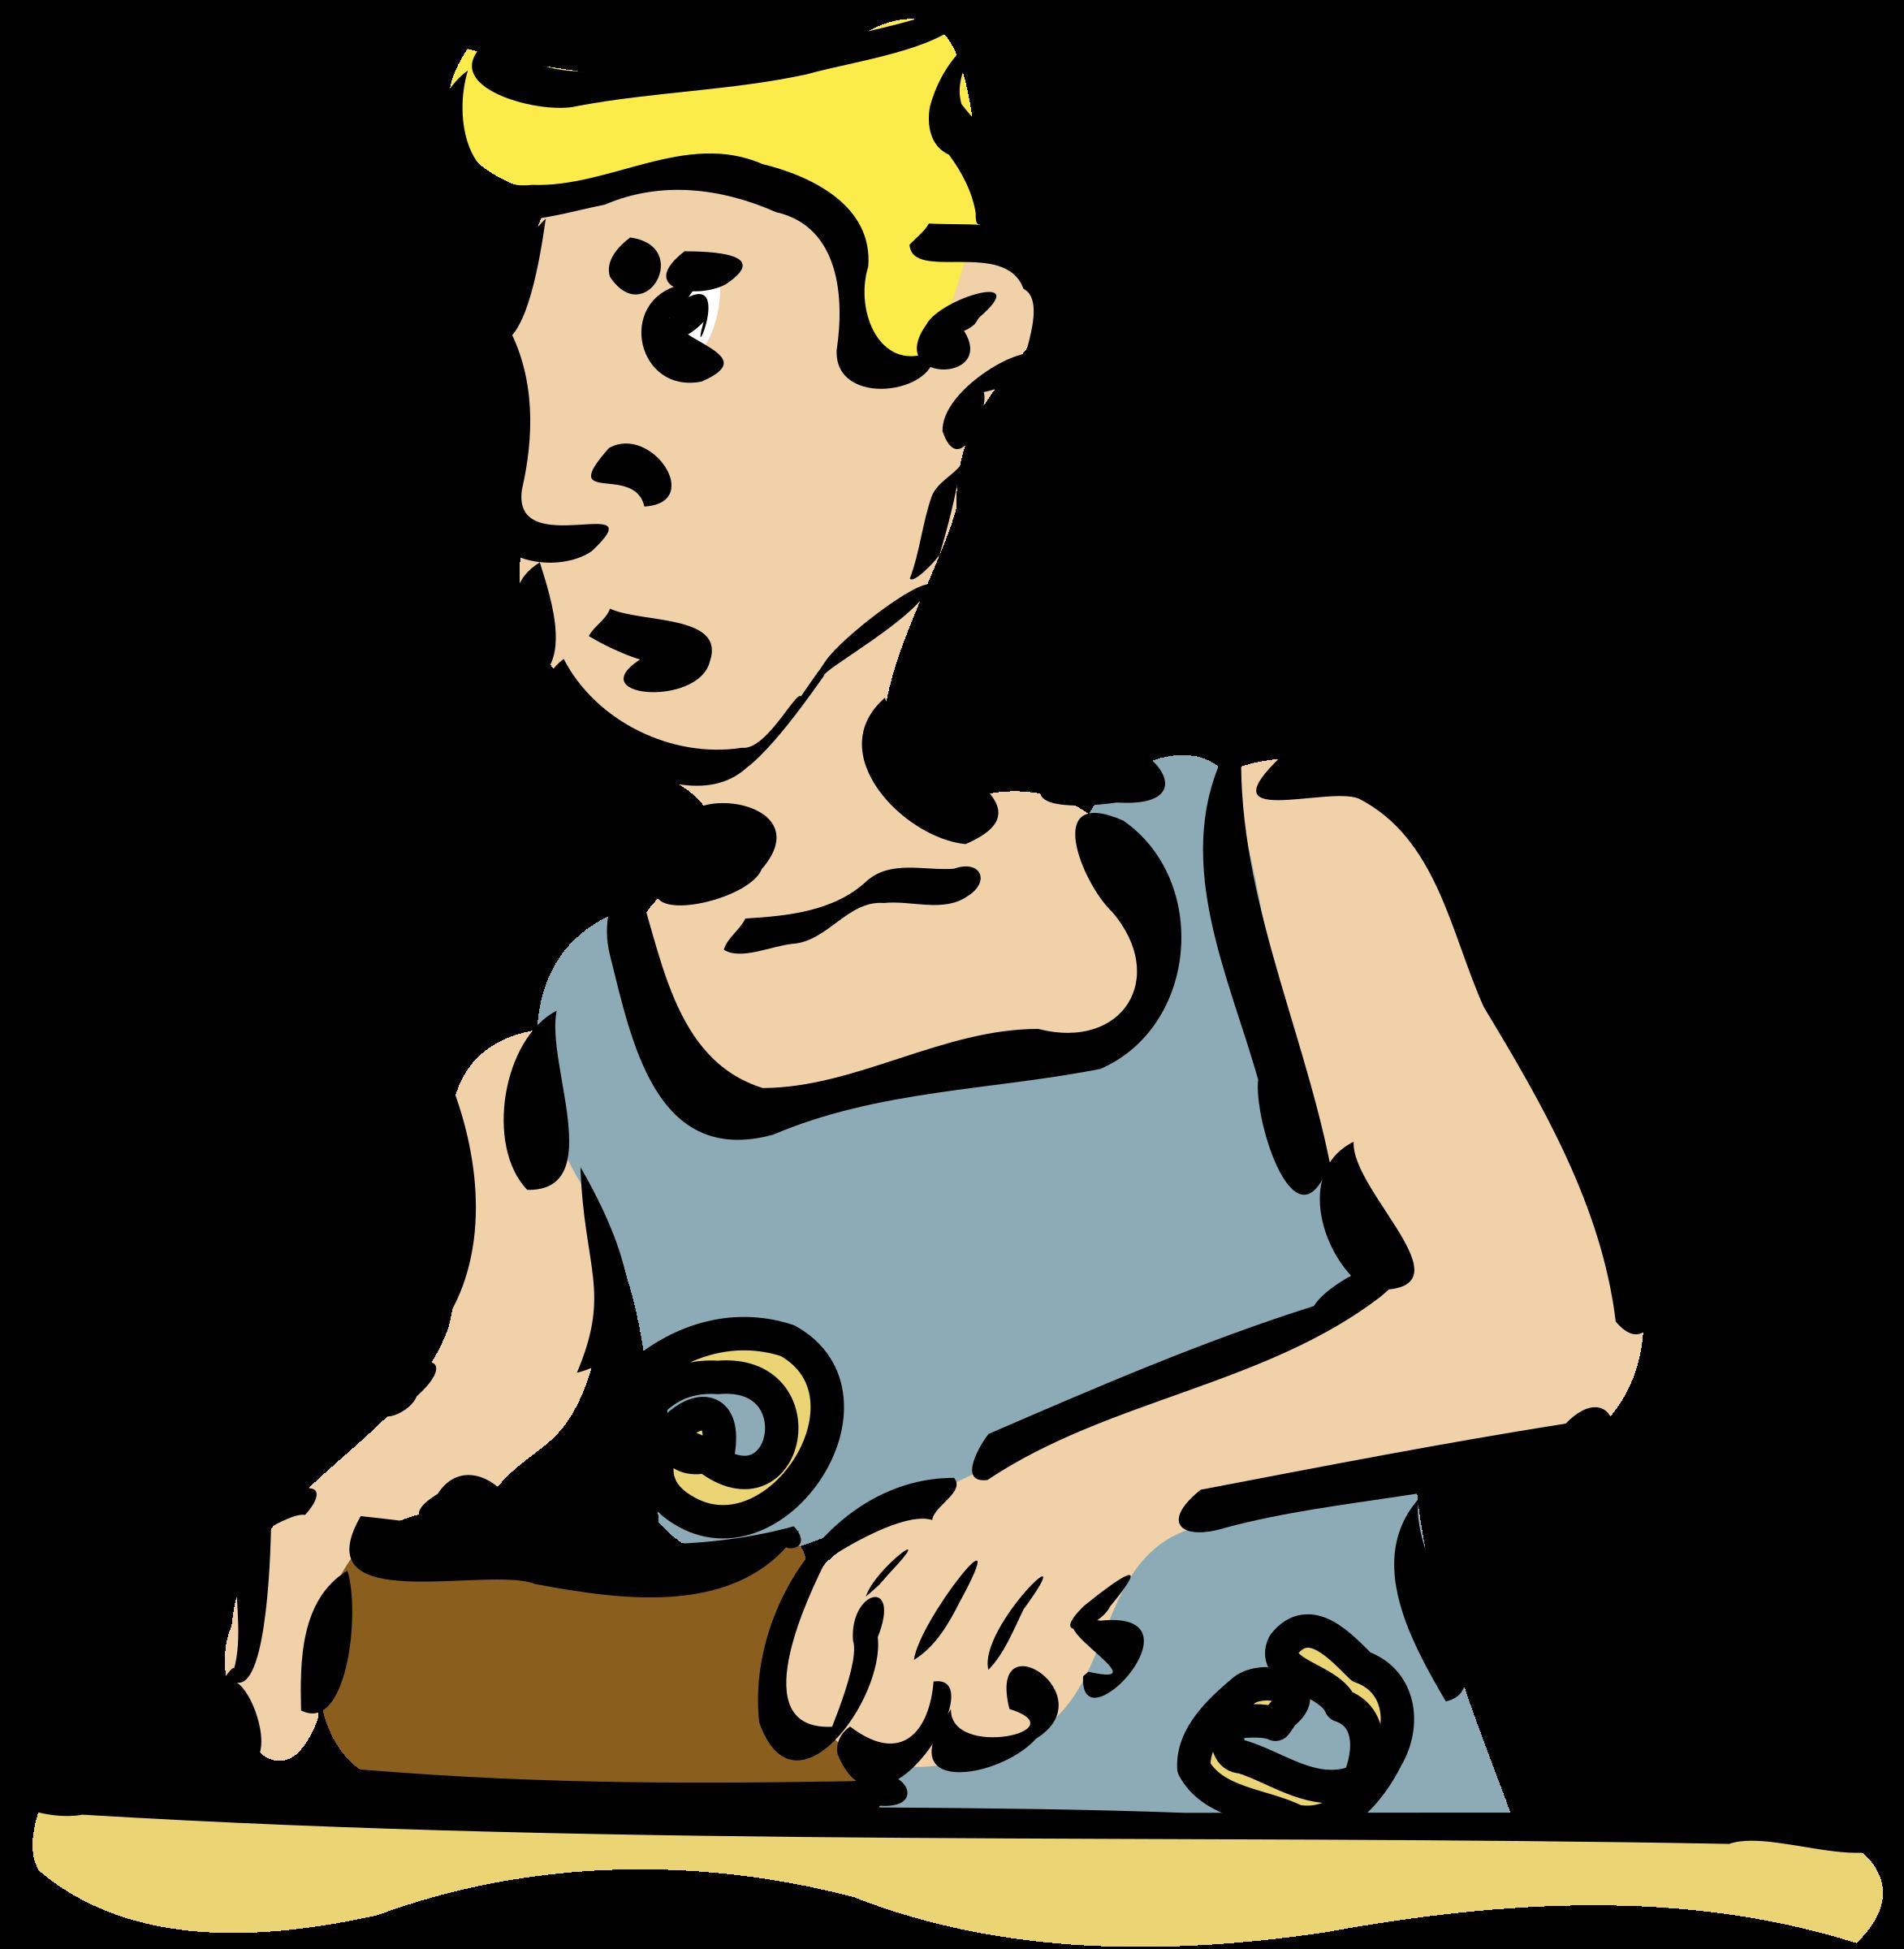 Cabinetmaker big image png. Working clipart carpenter